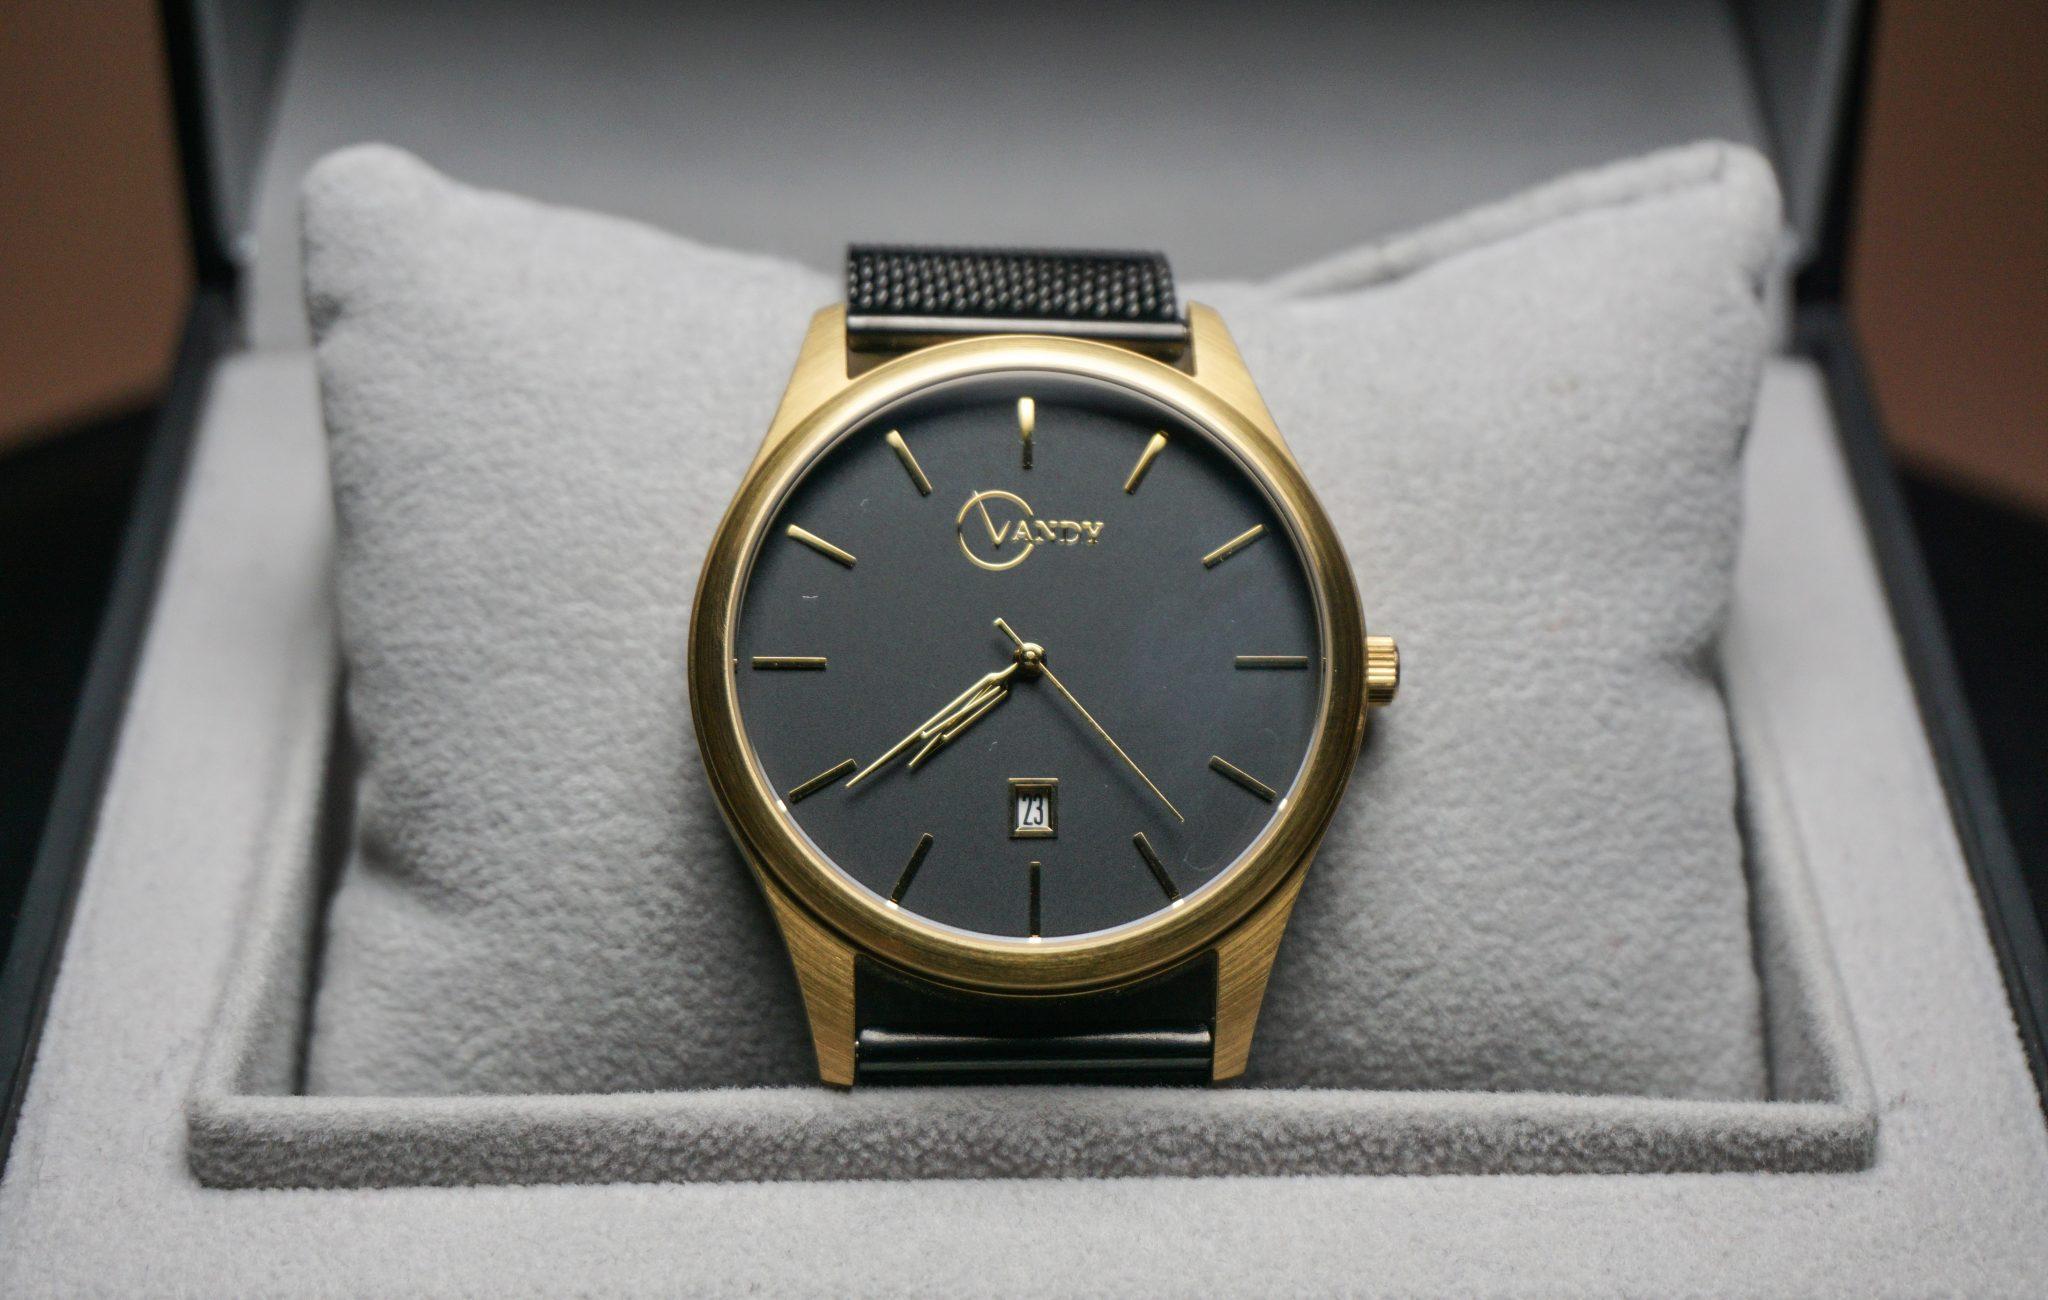 dapper-advisor-black-gold-vandy watches-watch